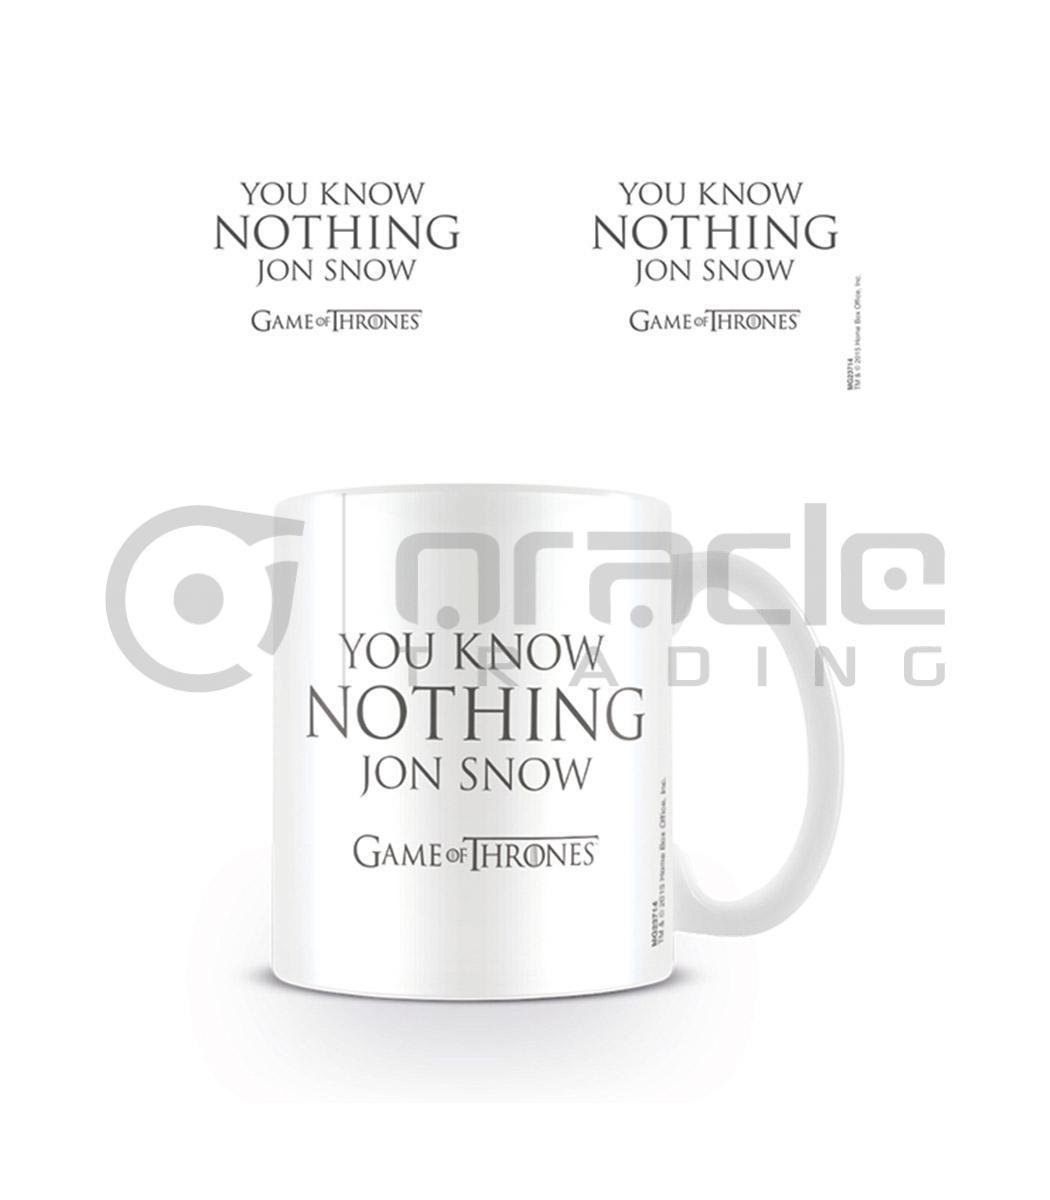 Game of Thrones Know Nothing Jon Snow Mug